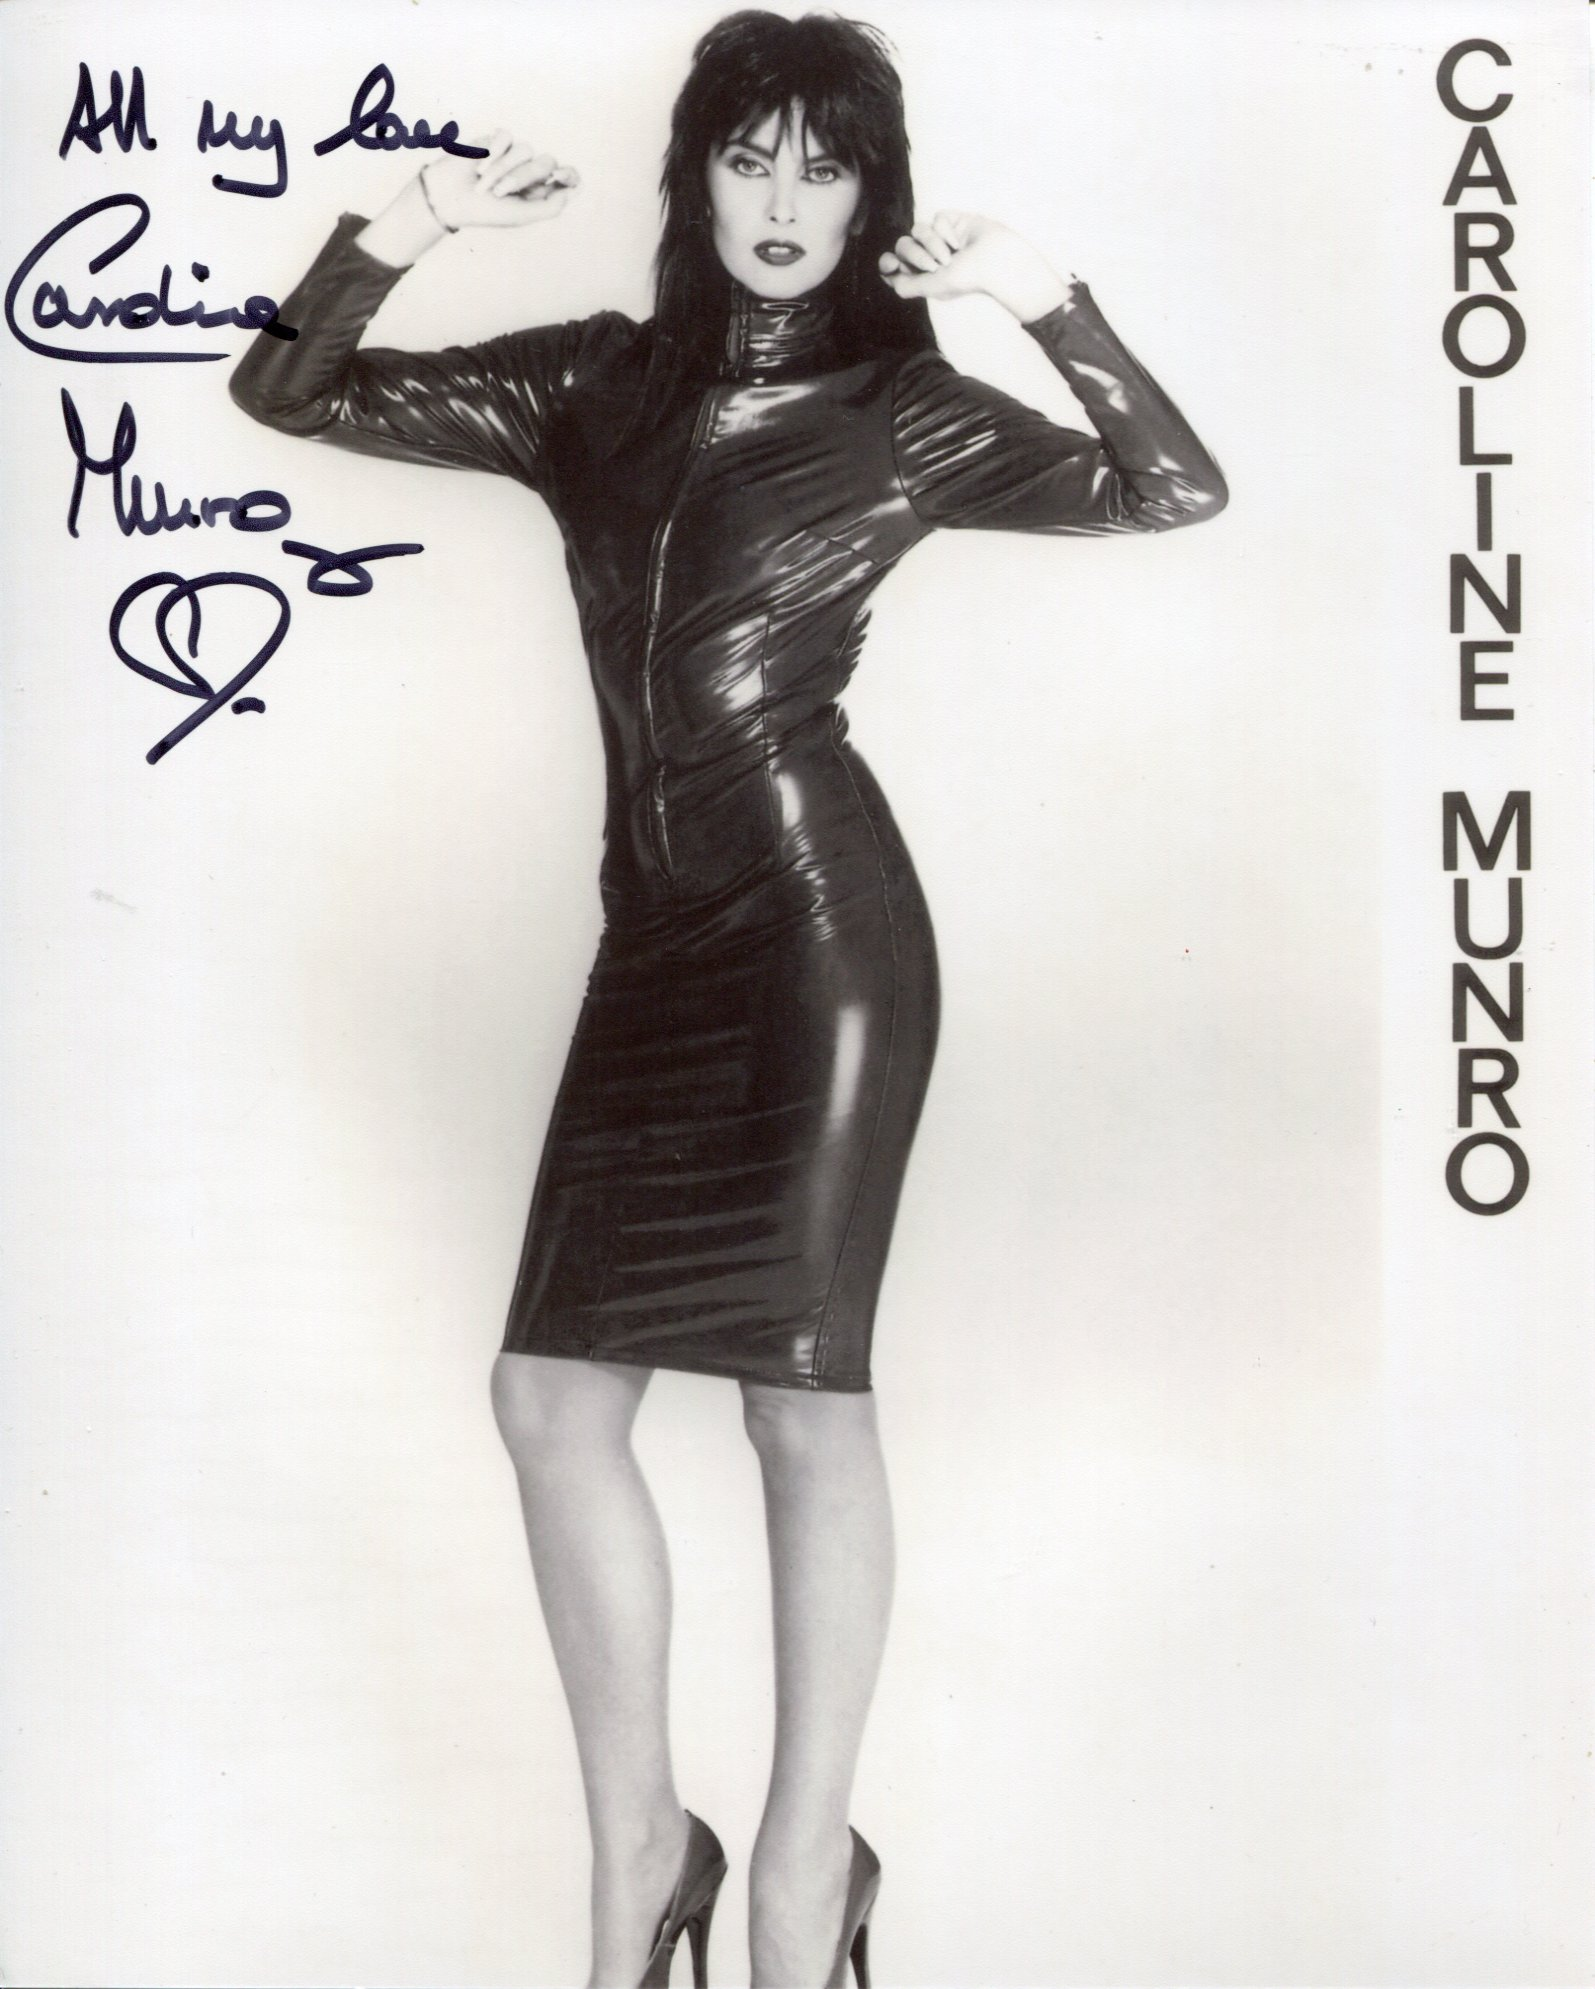 007 Bond girl. The Spy Who Loved Me actress Caroline Munro signed 8x10 sexy pose photo. Good